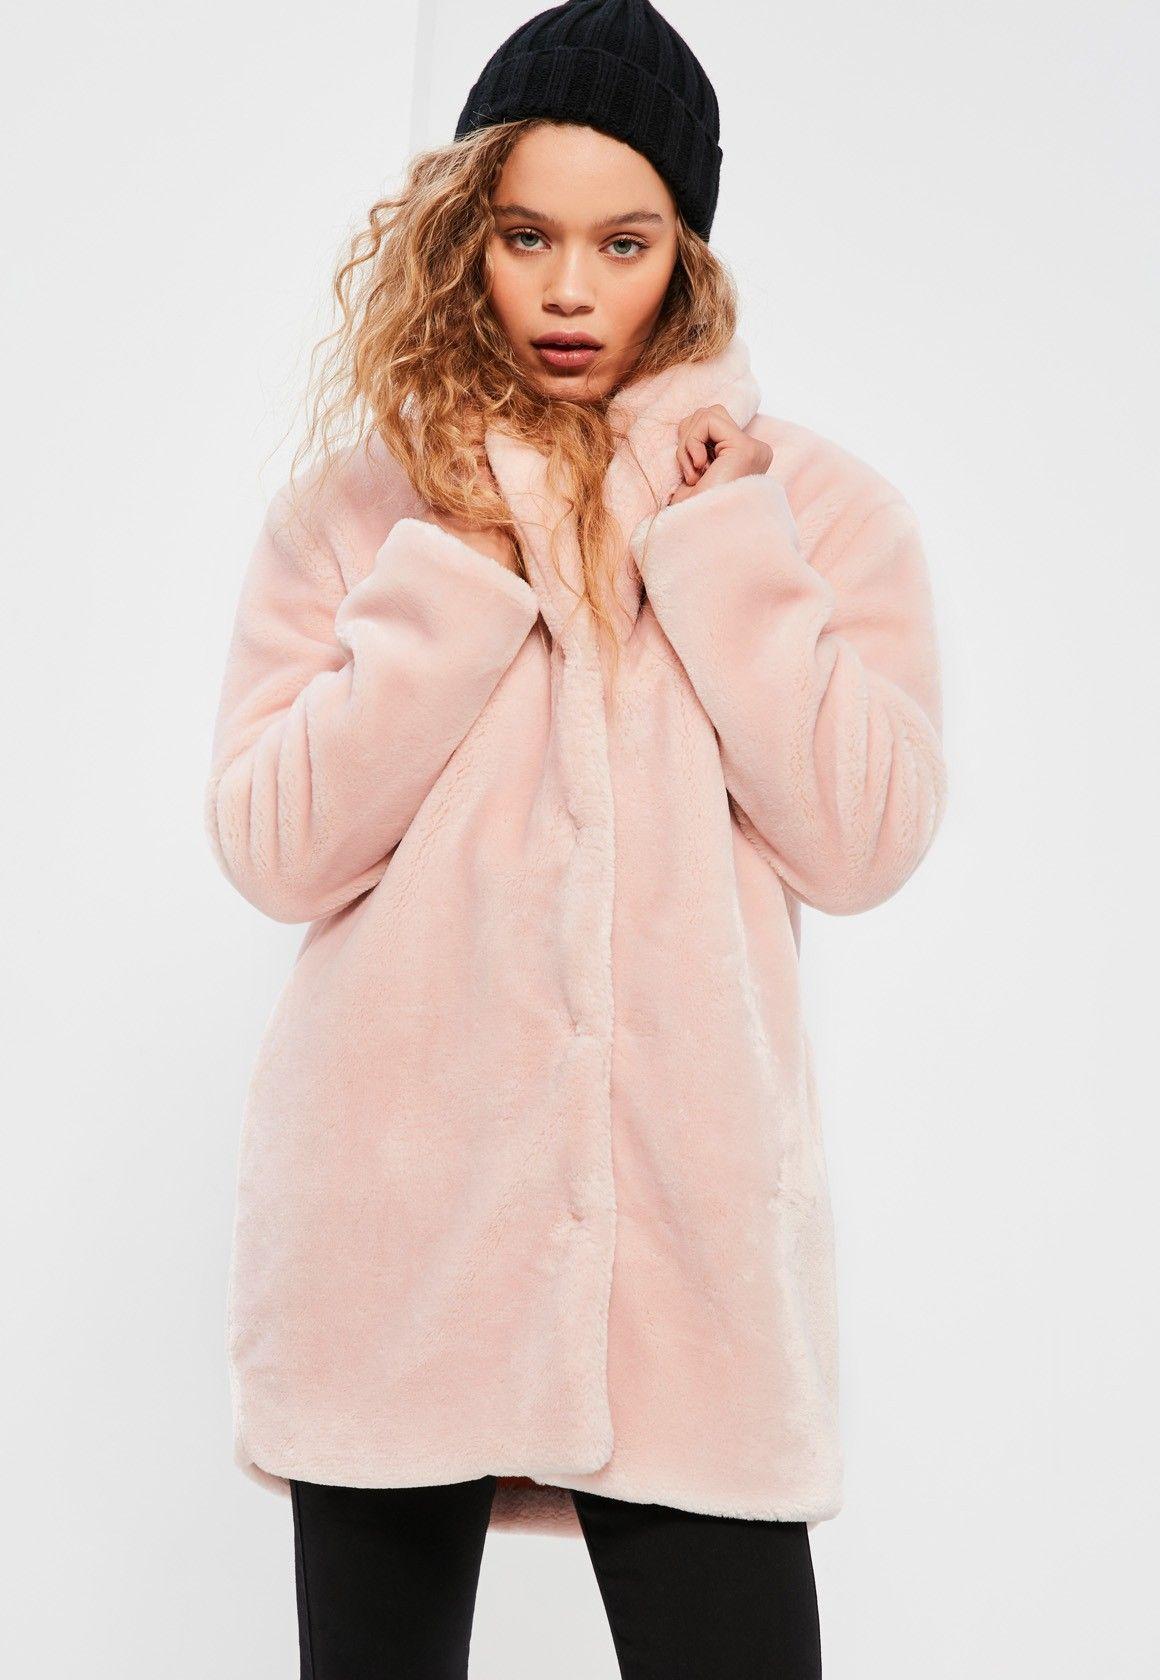 Missguided - Petite Pink Faux Fur Coat | Winter Stuff | Pinterest ...